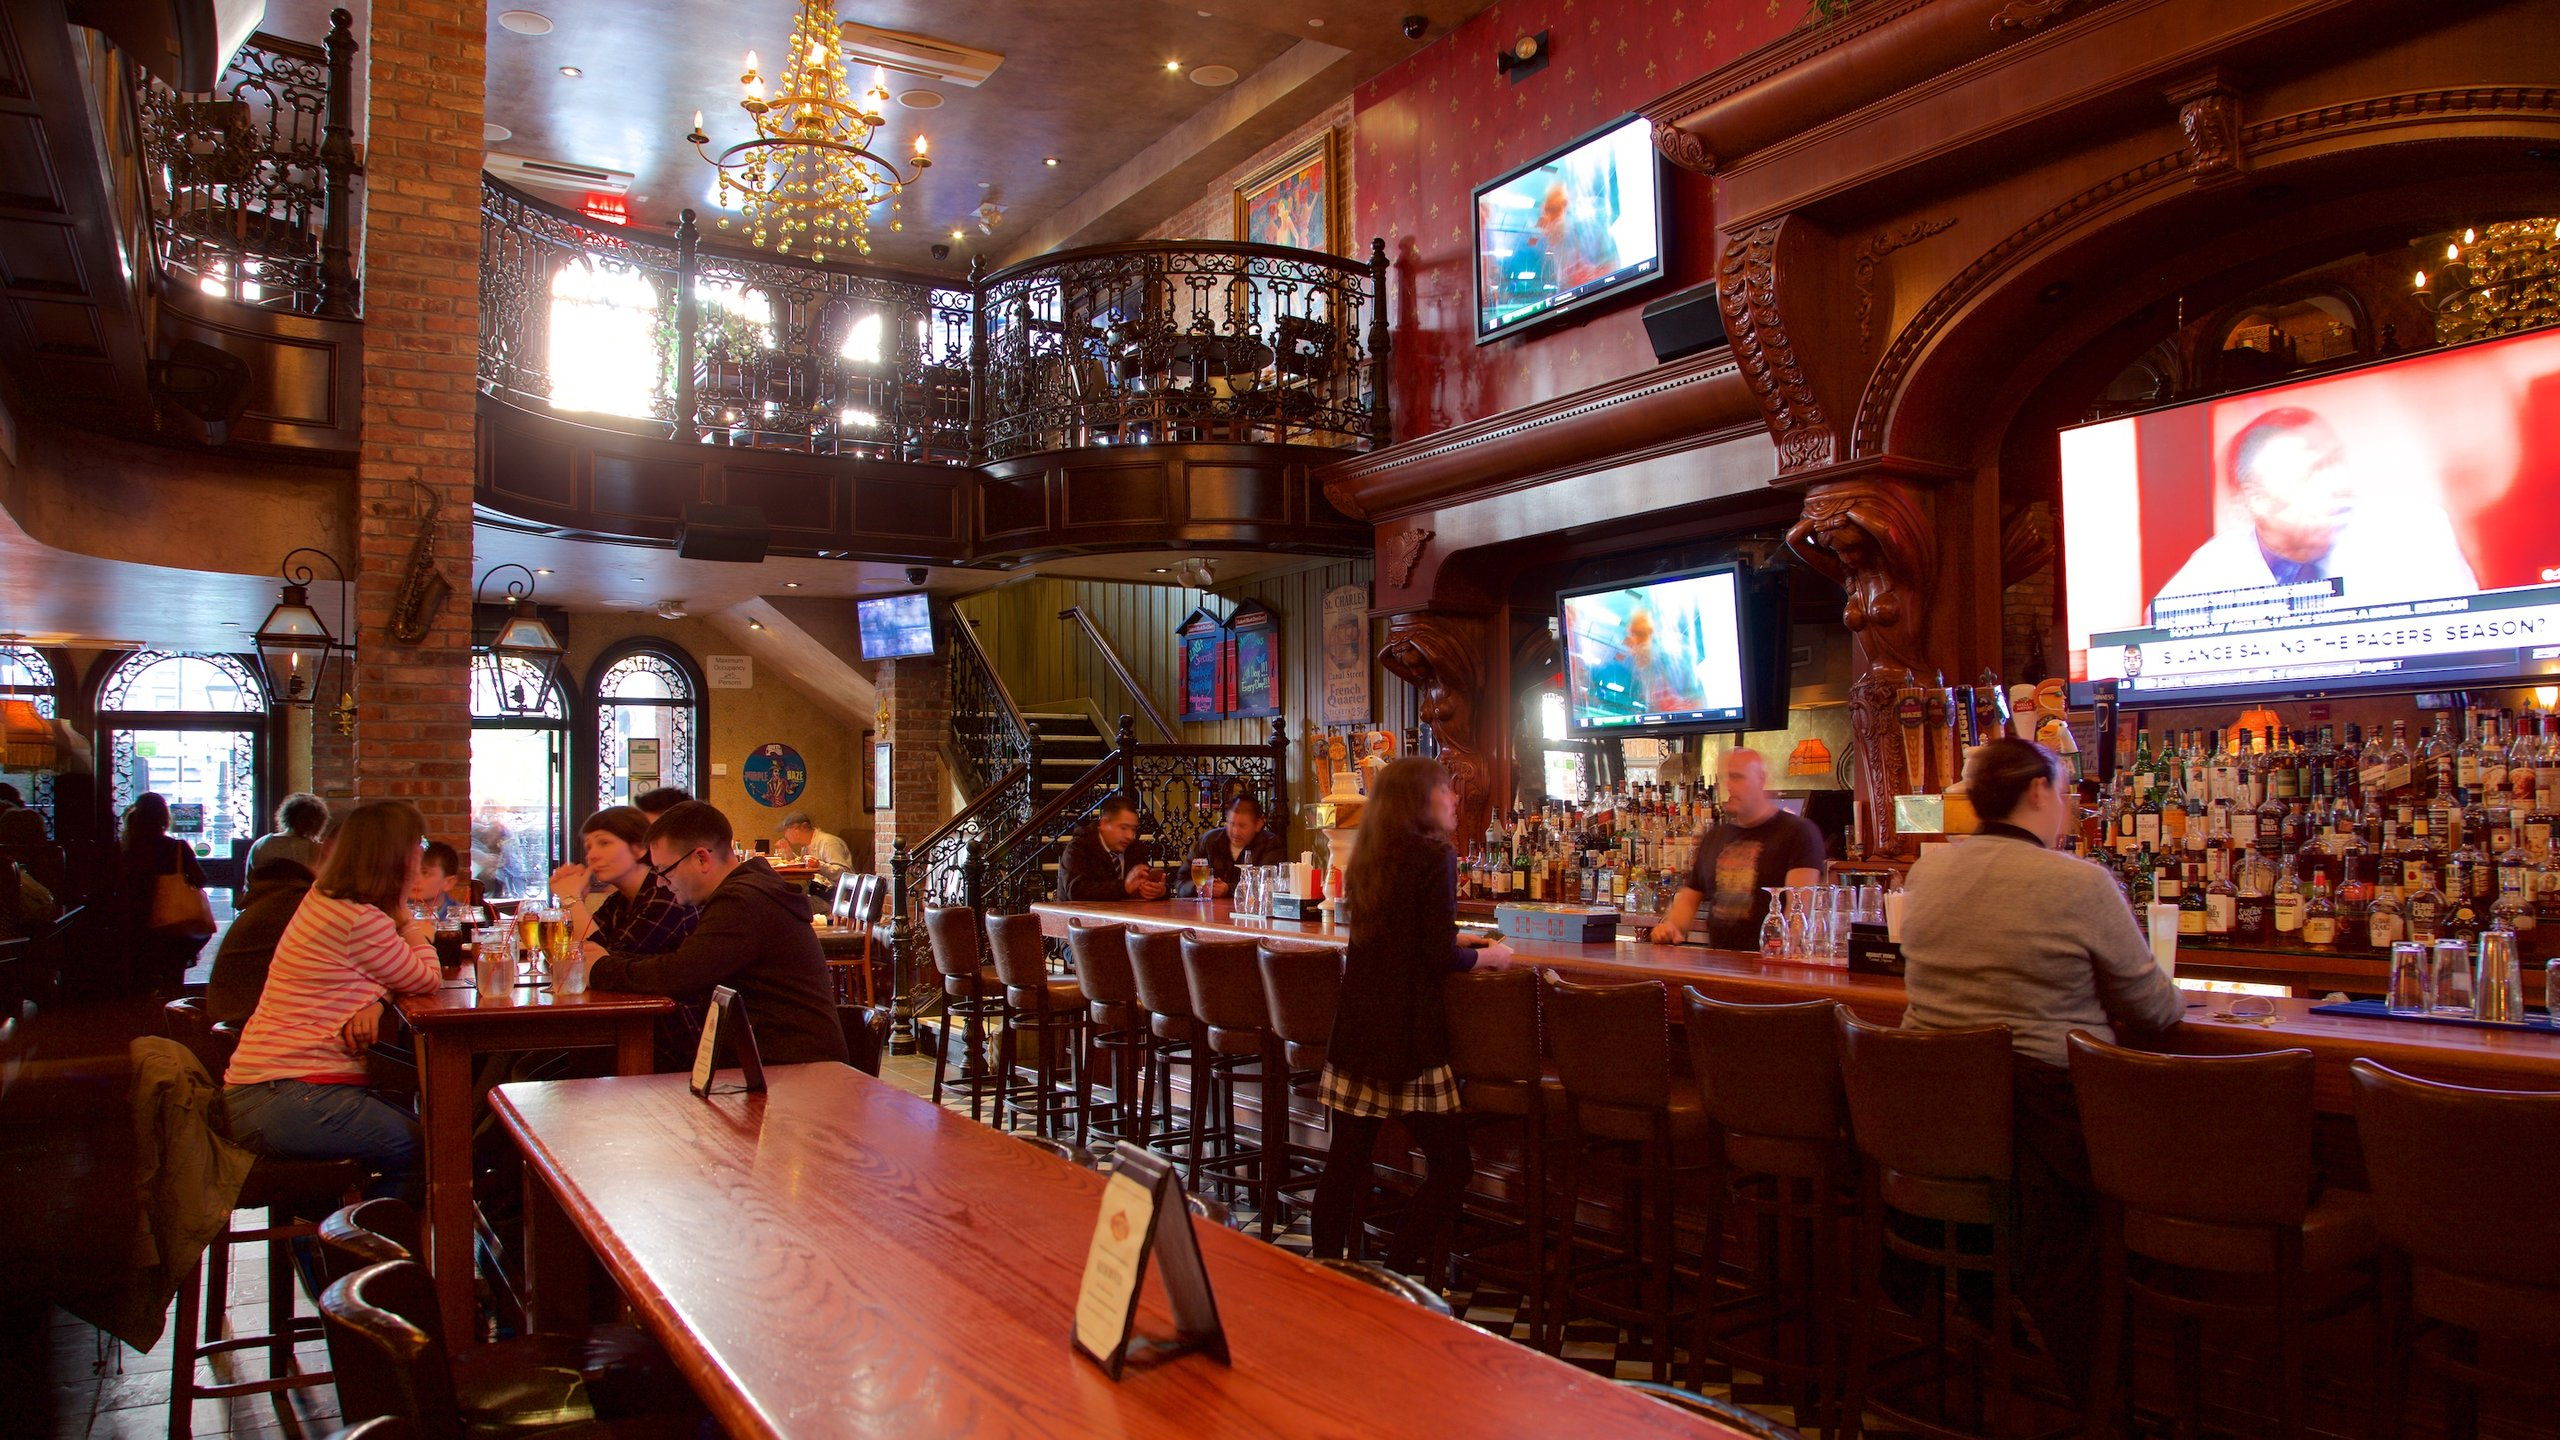 Hell's Kitchen, New York, New York, United States of America